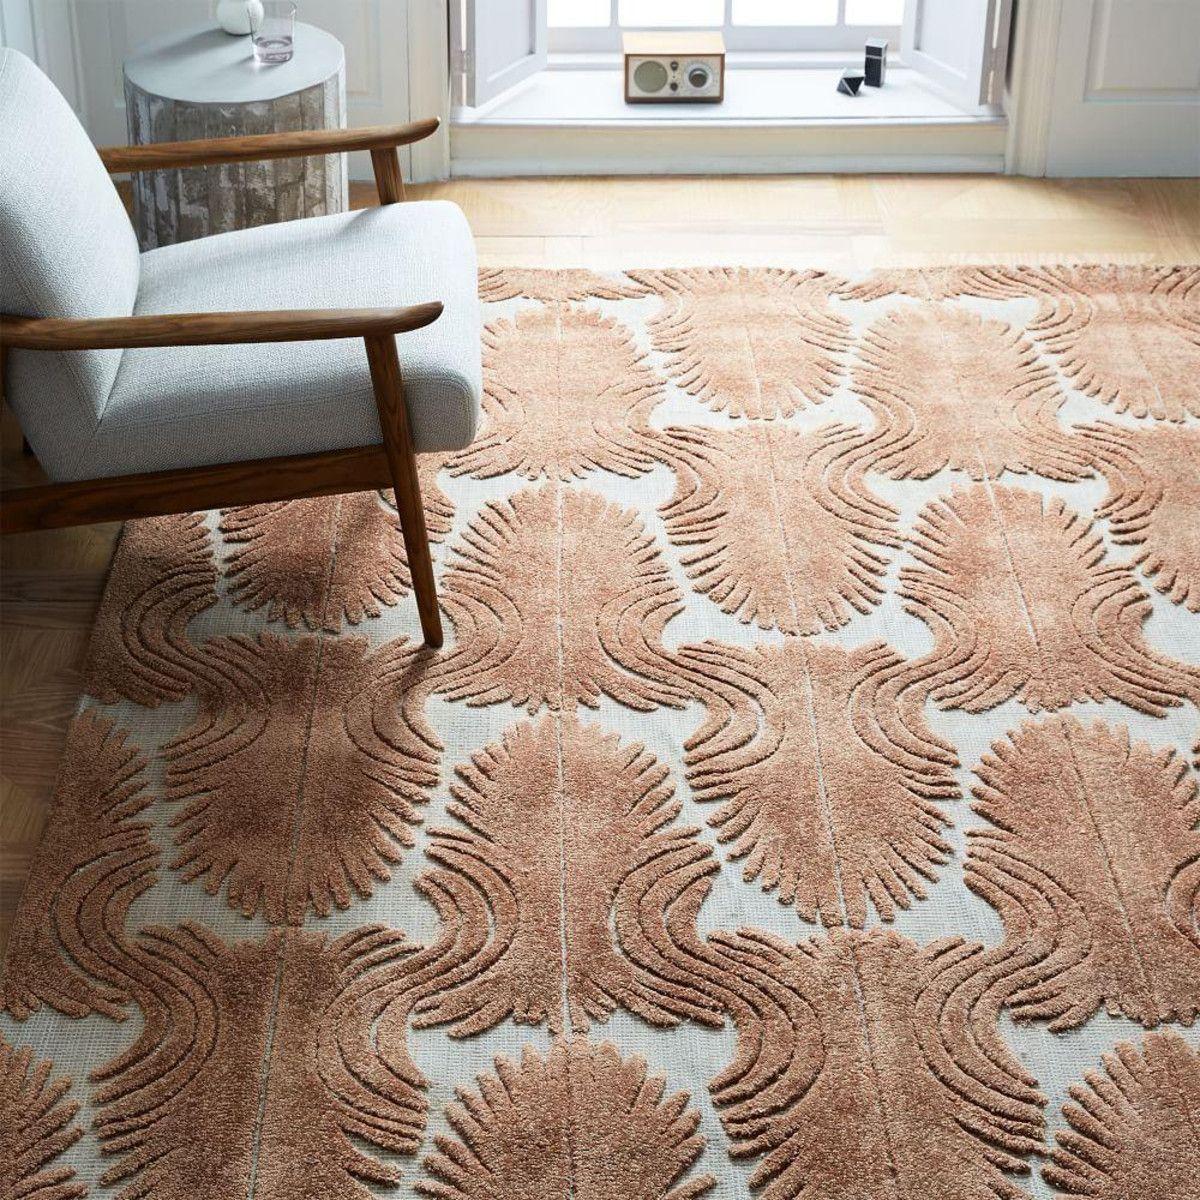 Deco Fan Rug - Copper Rust | Living room area rugs, Rugs ...